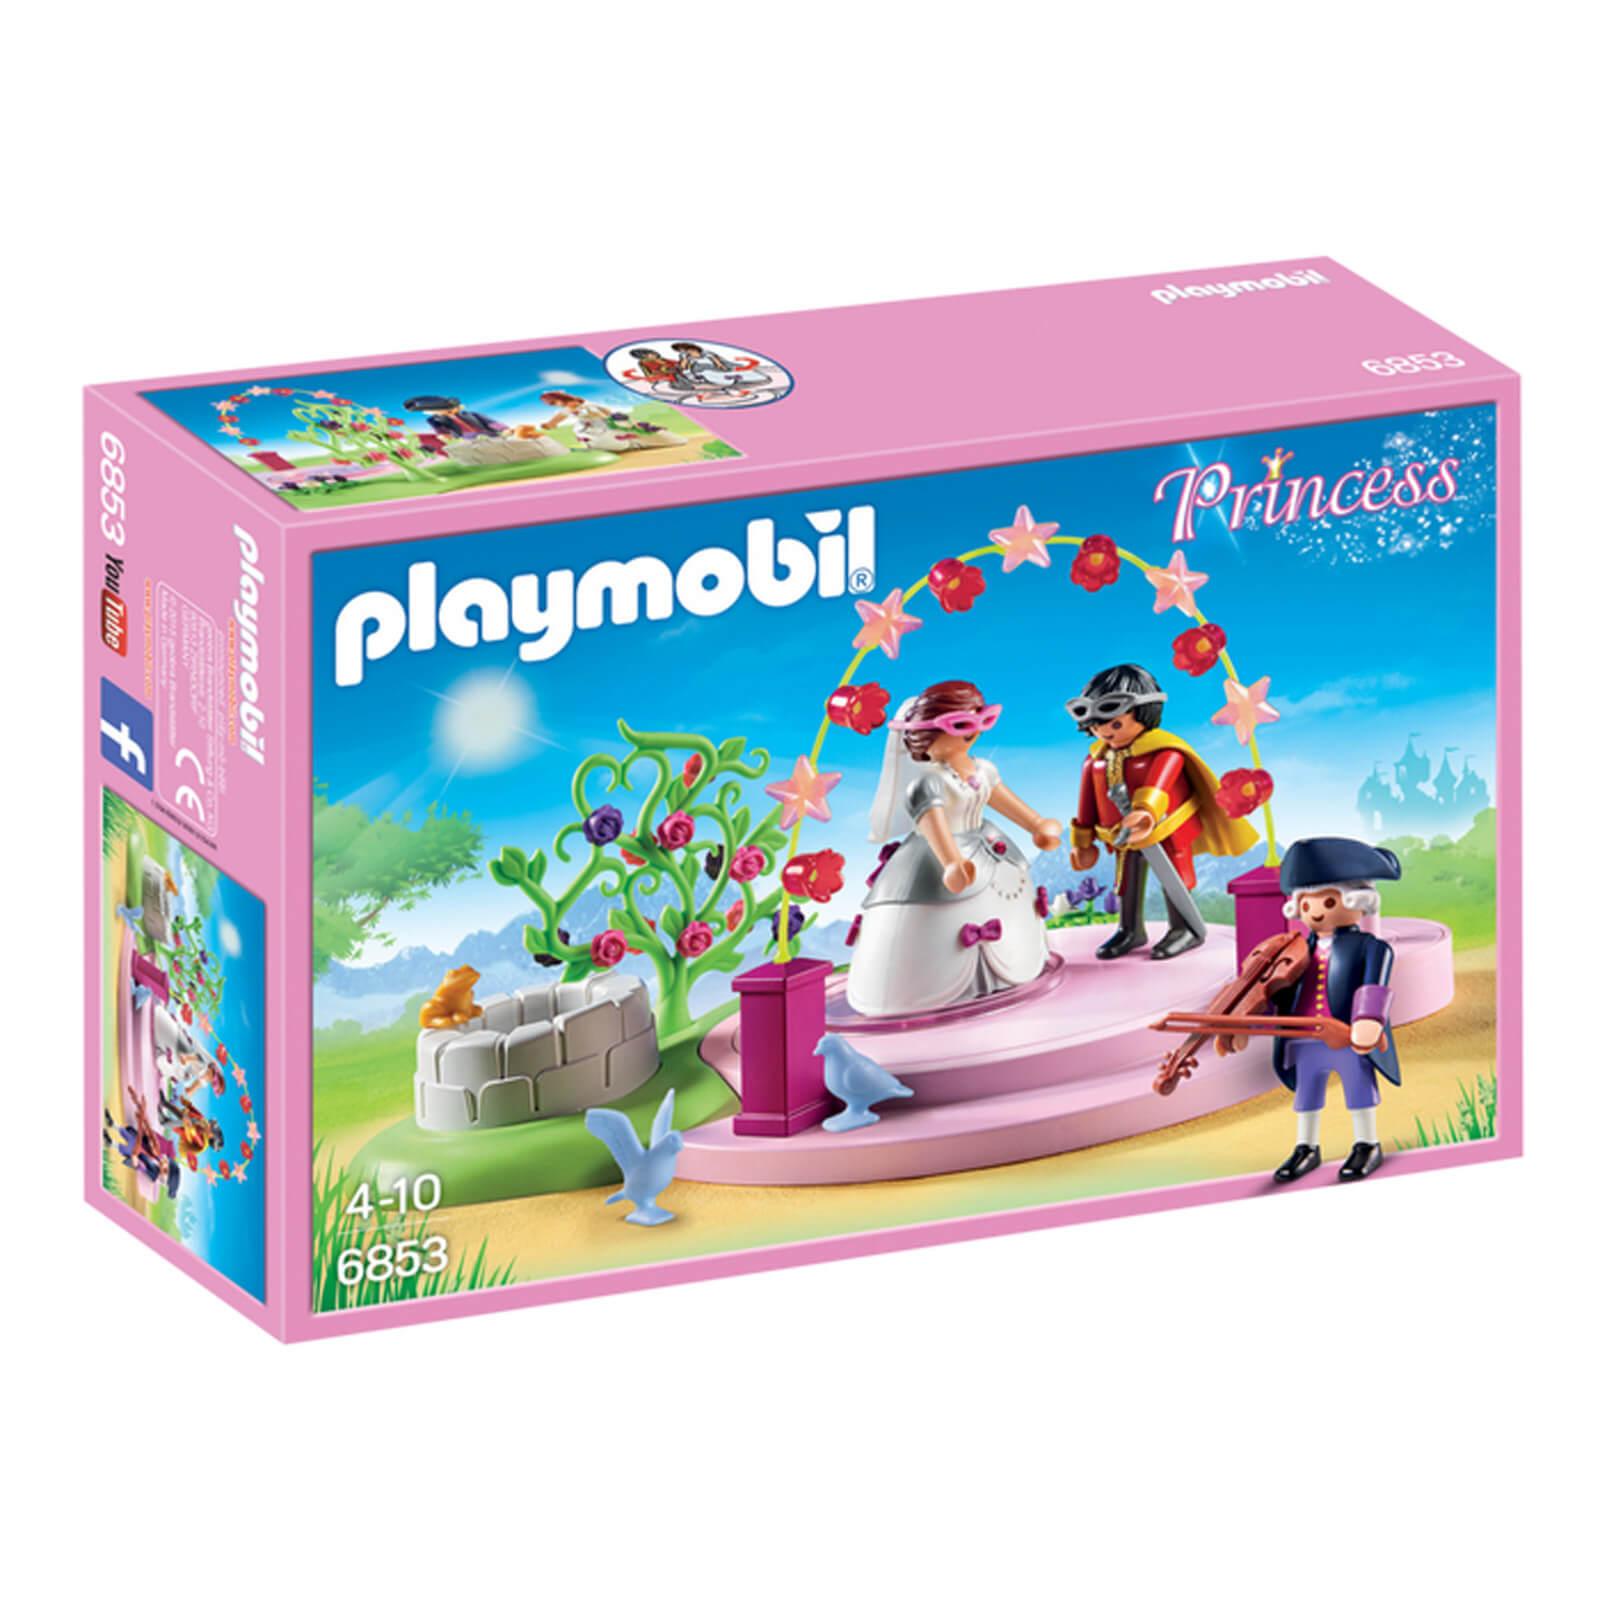 Playmobil Princess Masked Ball With Rotating Dance Floor (6853)